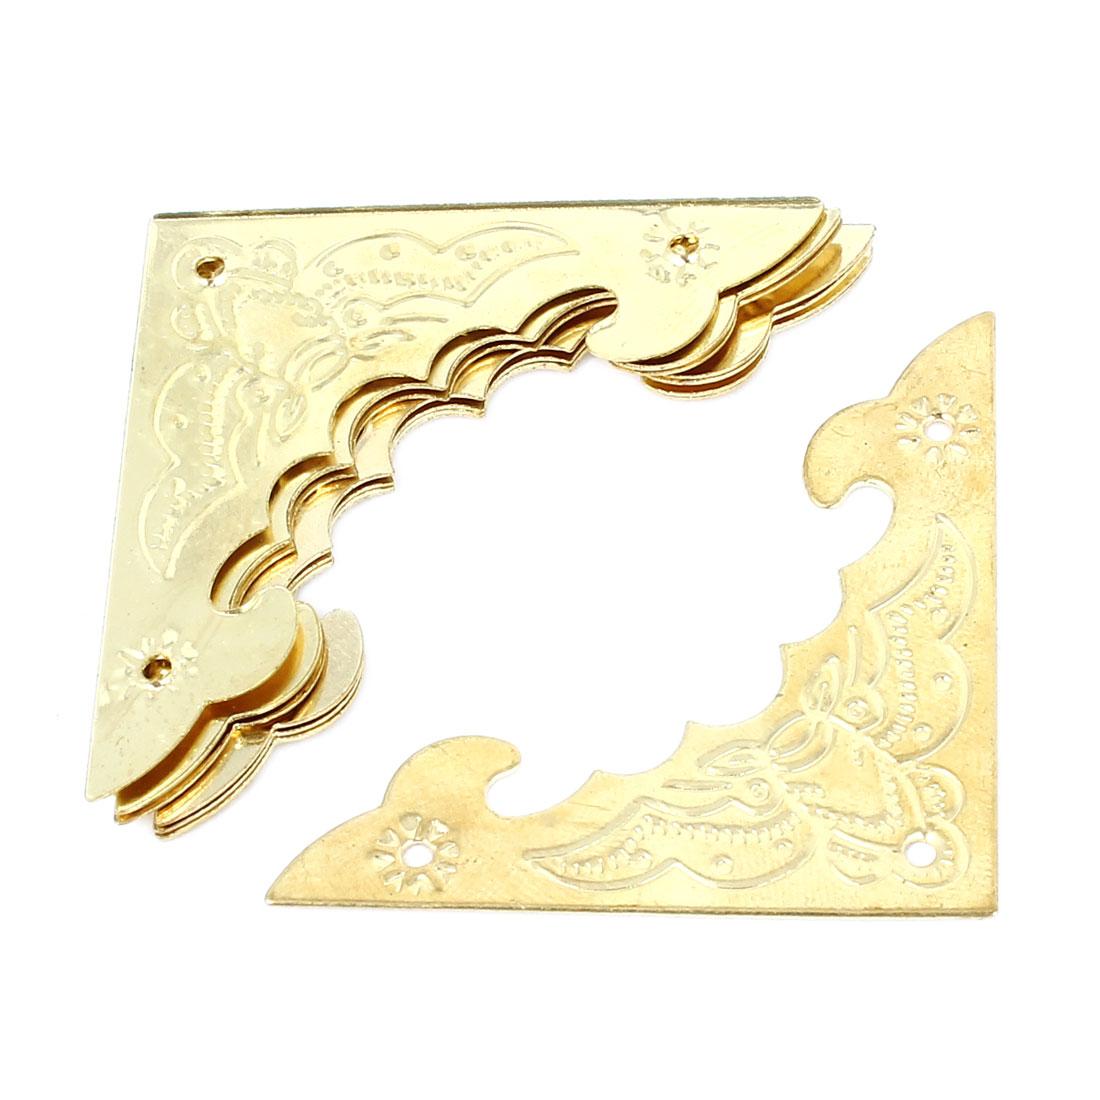 8pcs Hardware Bat Pattern Archaize Fillet Gold Tone 40mm Long for Wooden Box Decor